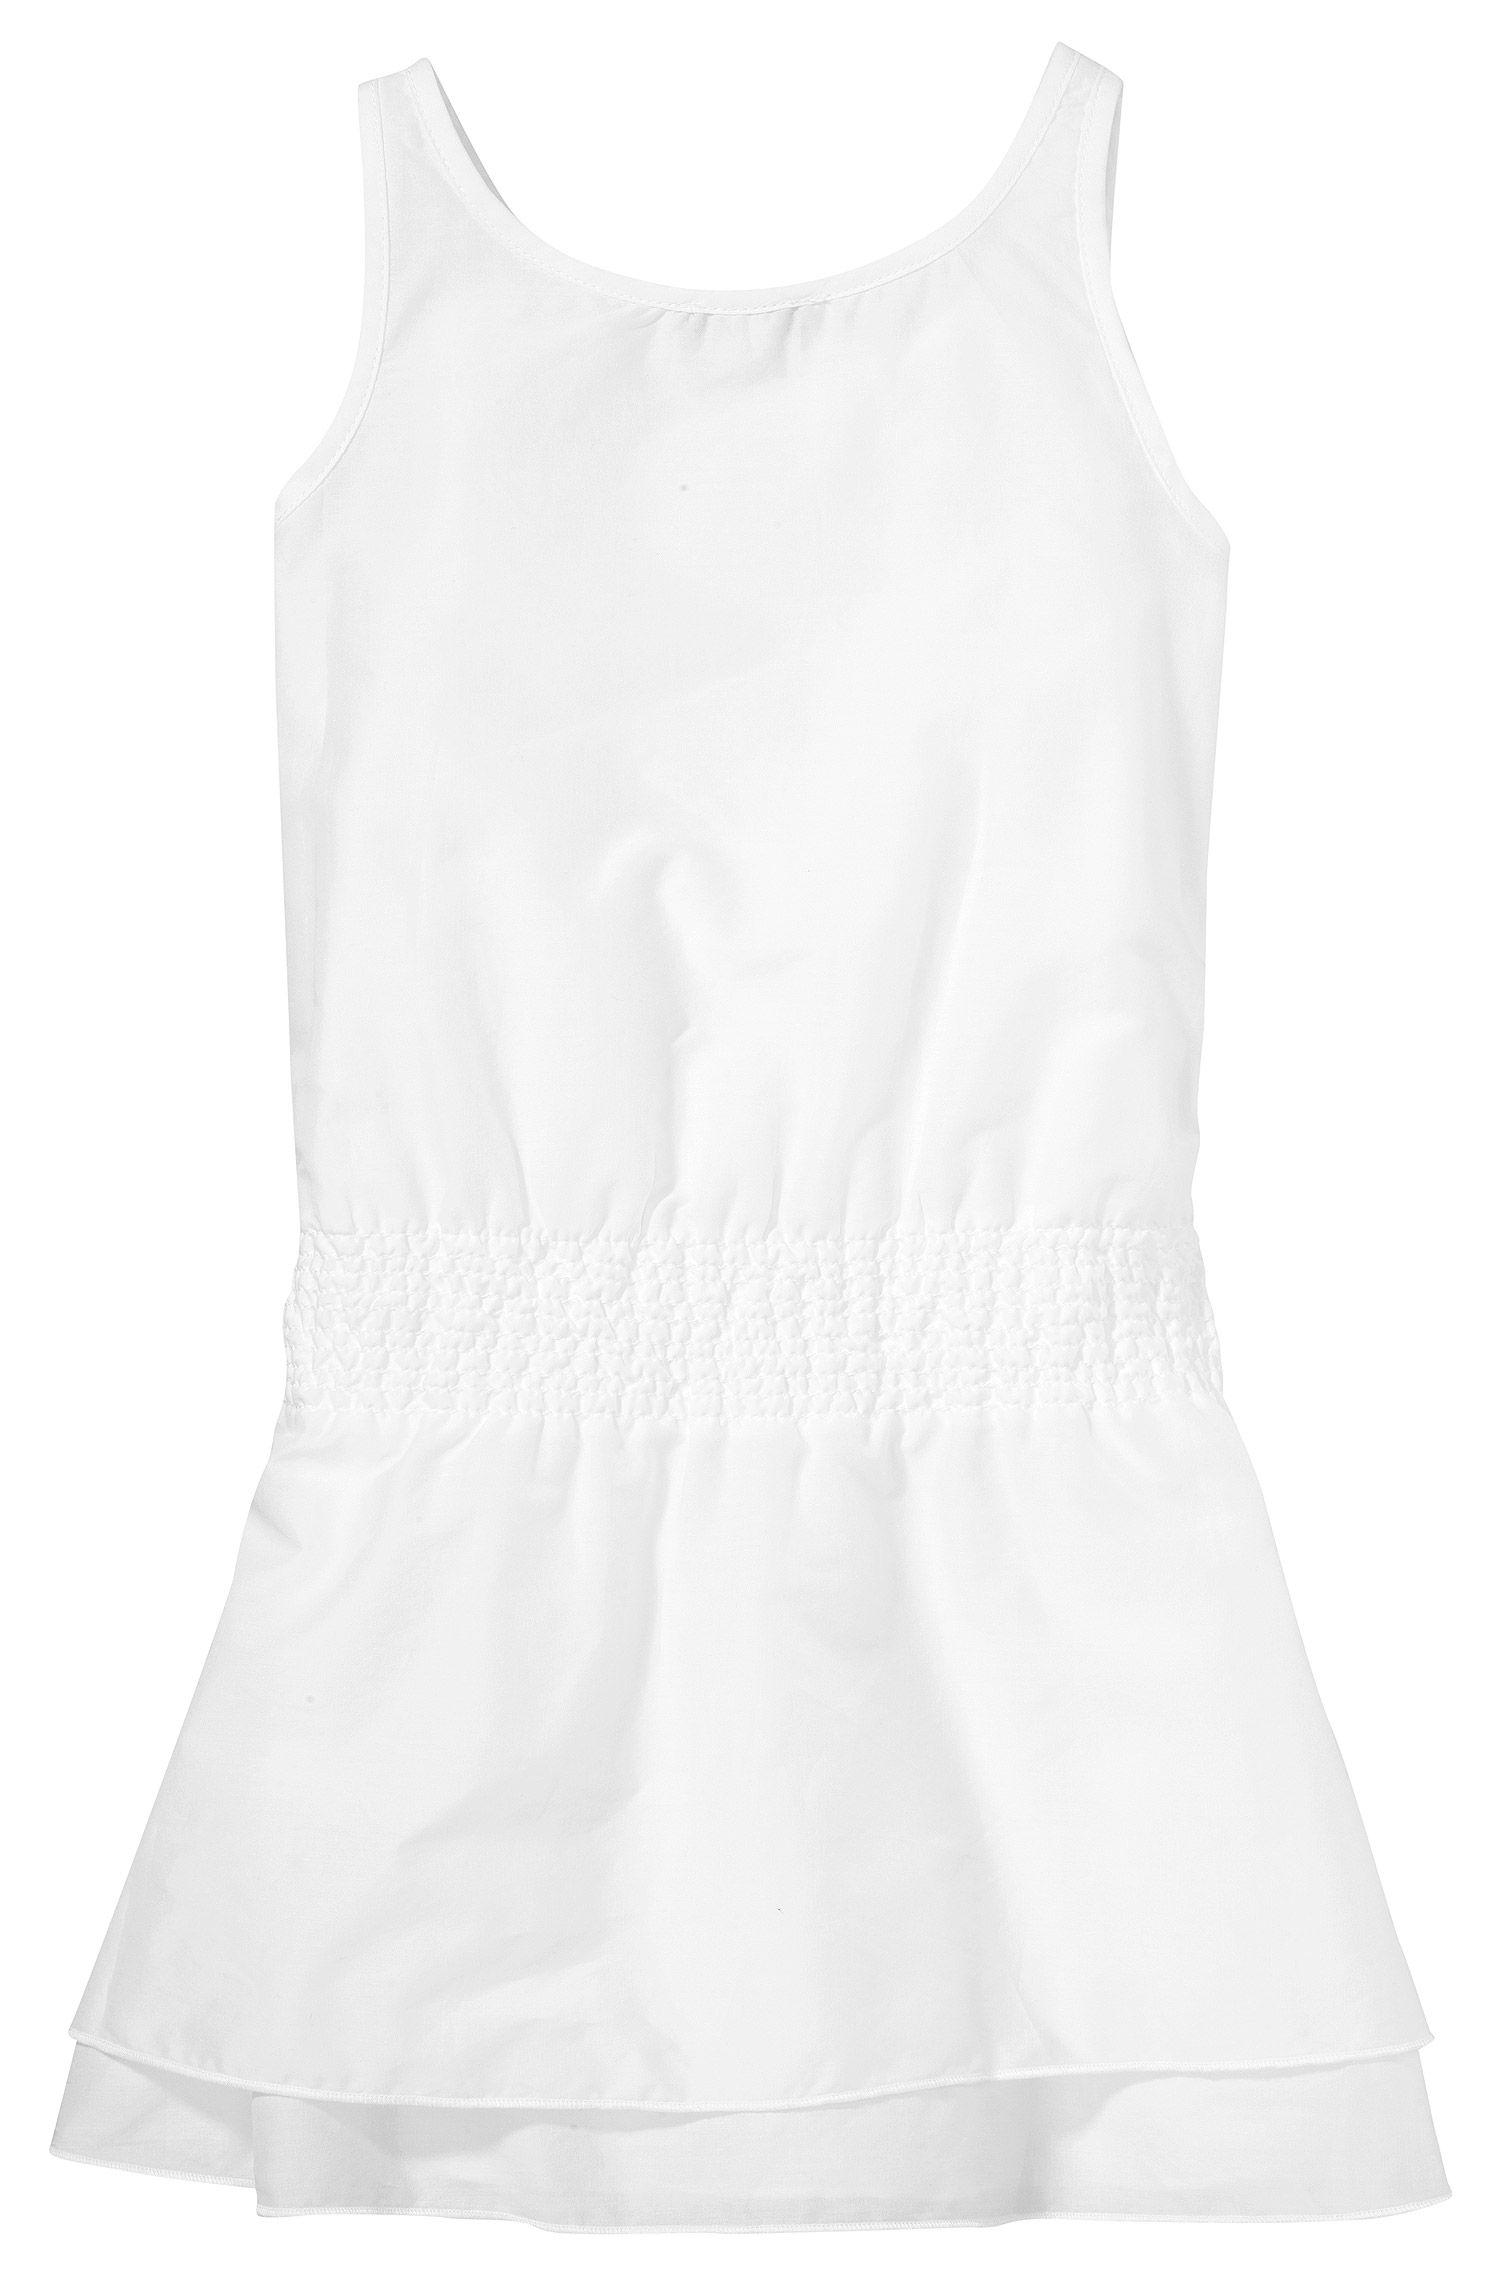 Robe pour enfant «J12122» en coton